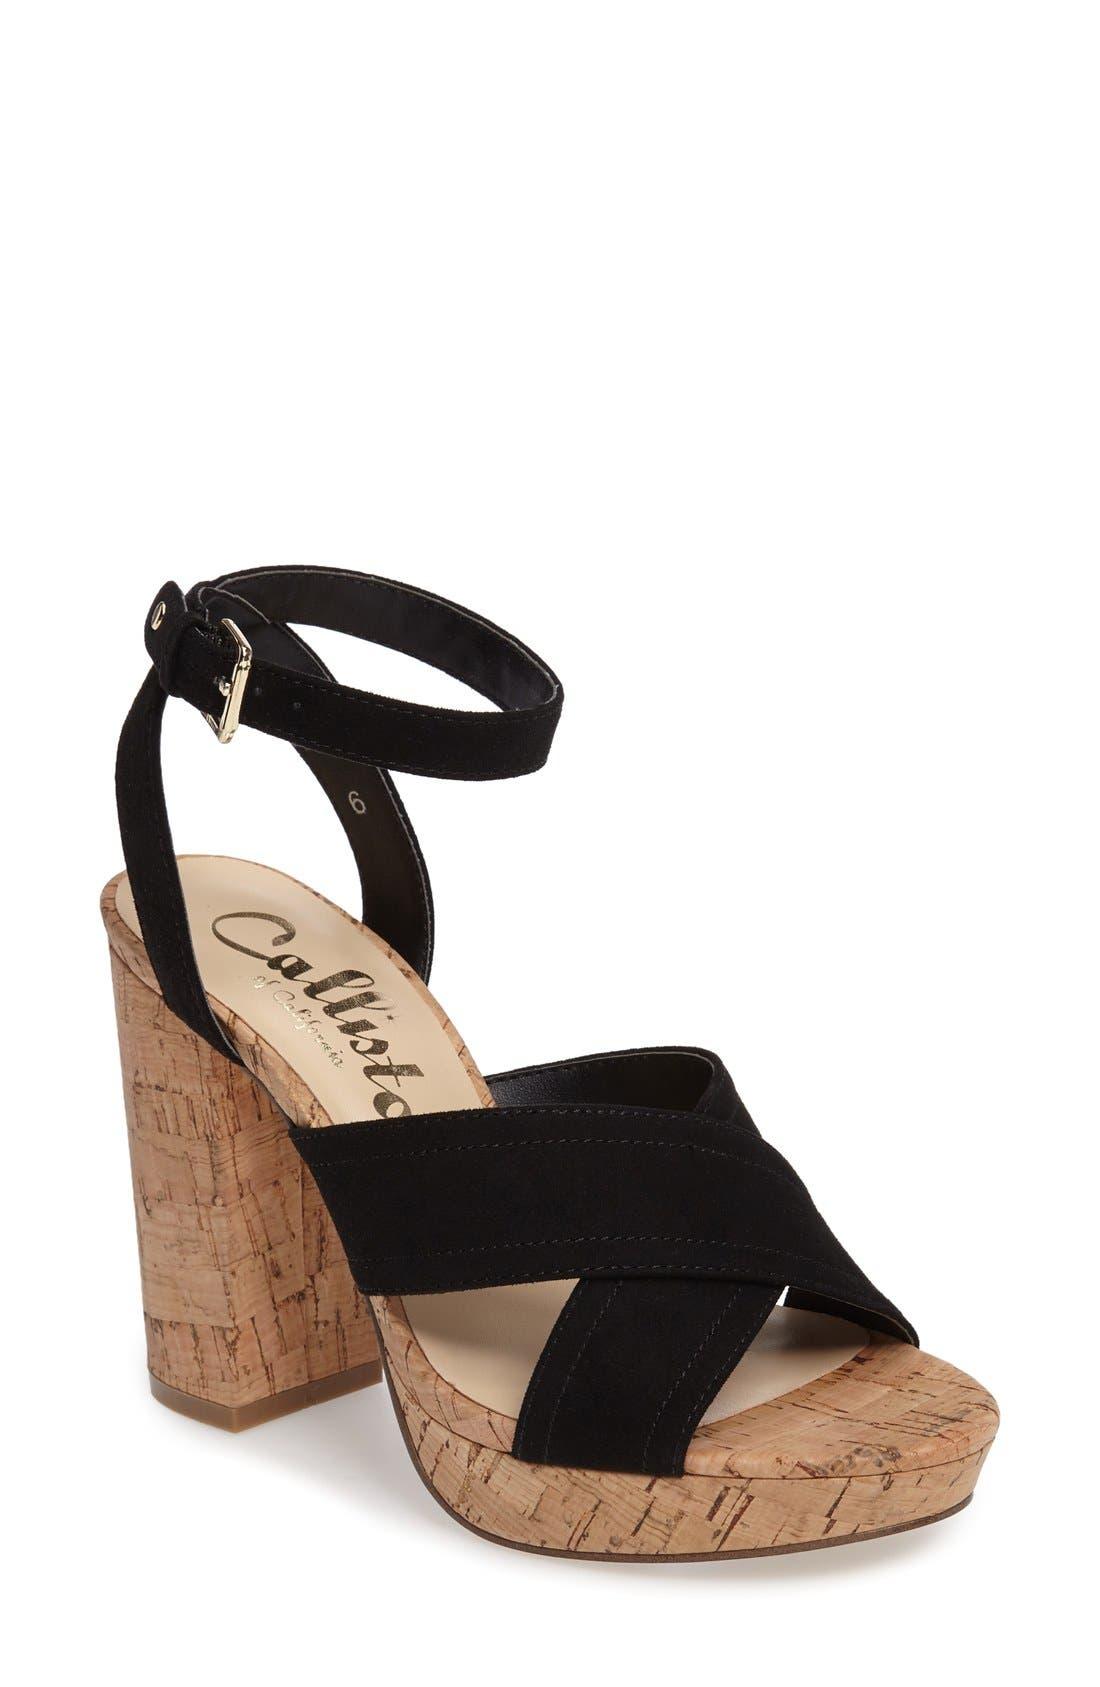 Alternate Image 1 Selected - Callisto Windye Platform Ankle Strap Sandal (Women)